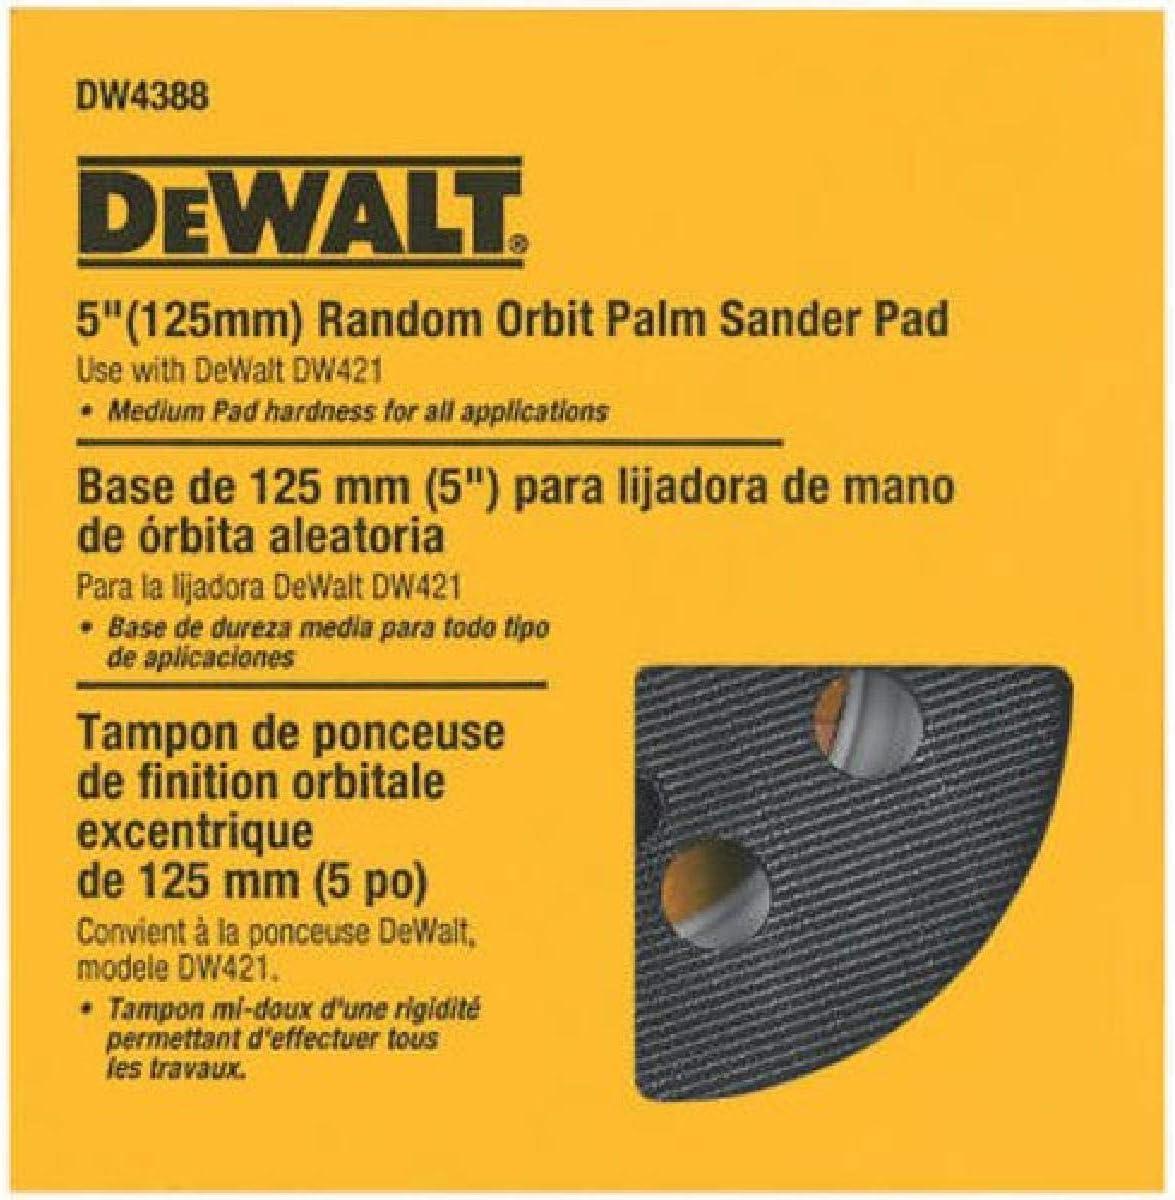 DEWALT Sander Pad, 5-Inch Orbital, Fits the DW421K and DW423K (DW4388) - Sanding Blocks -